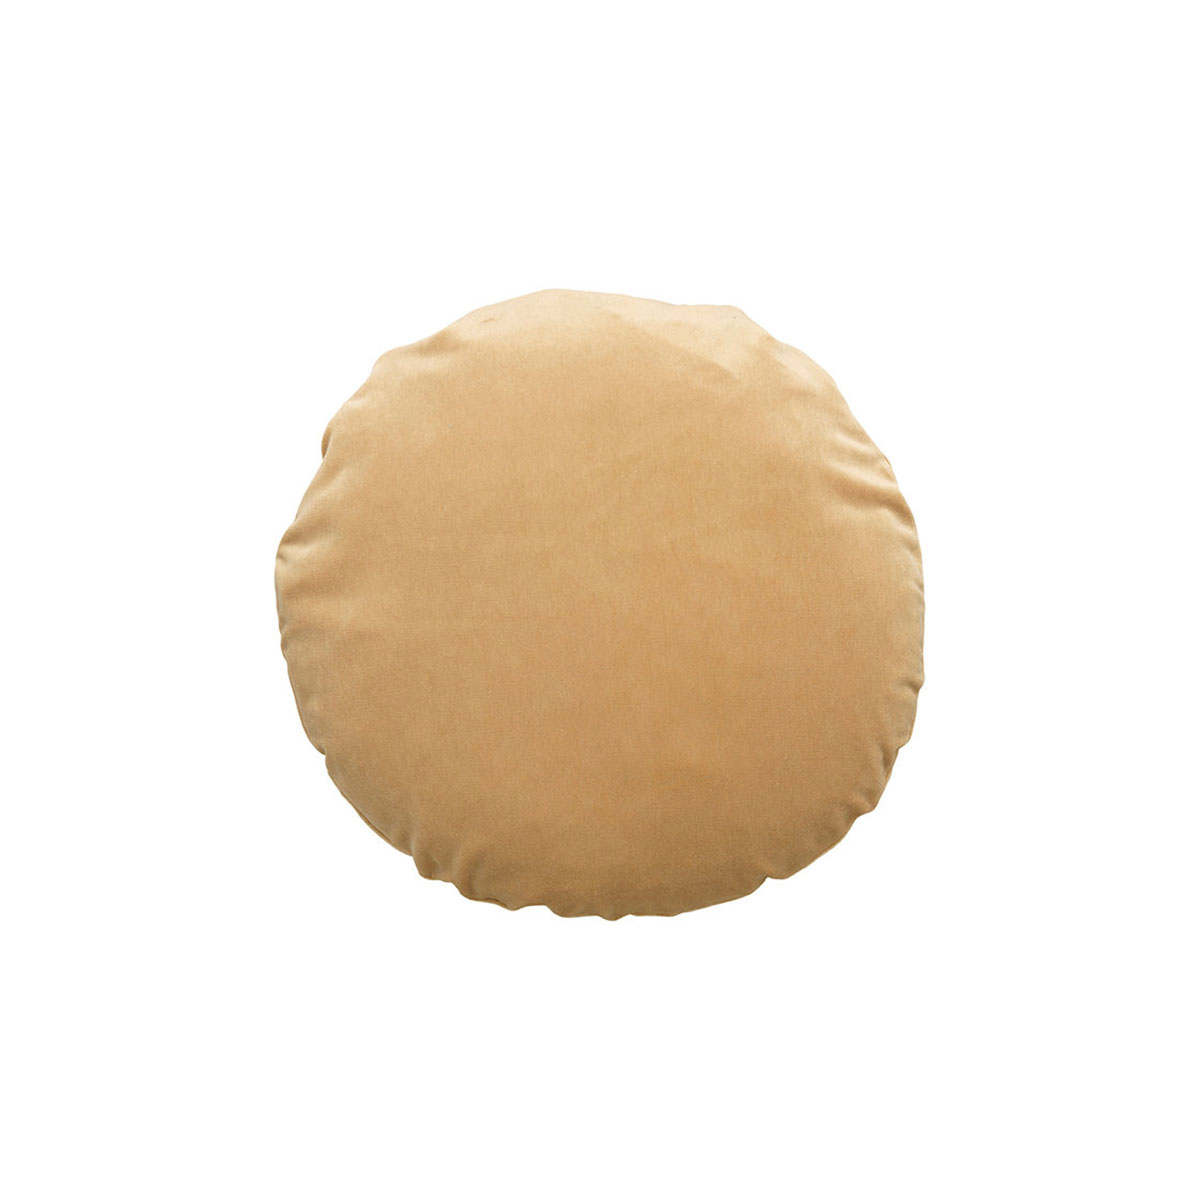 45Ø Basic Barley Pute